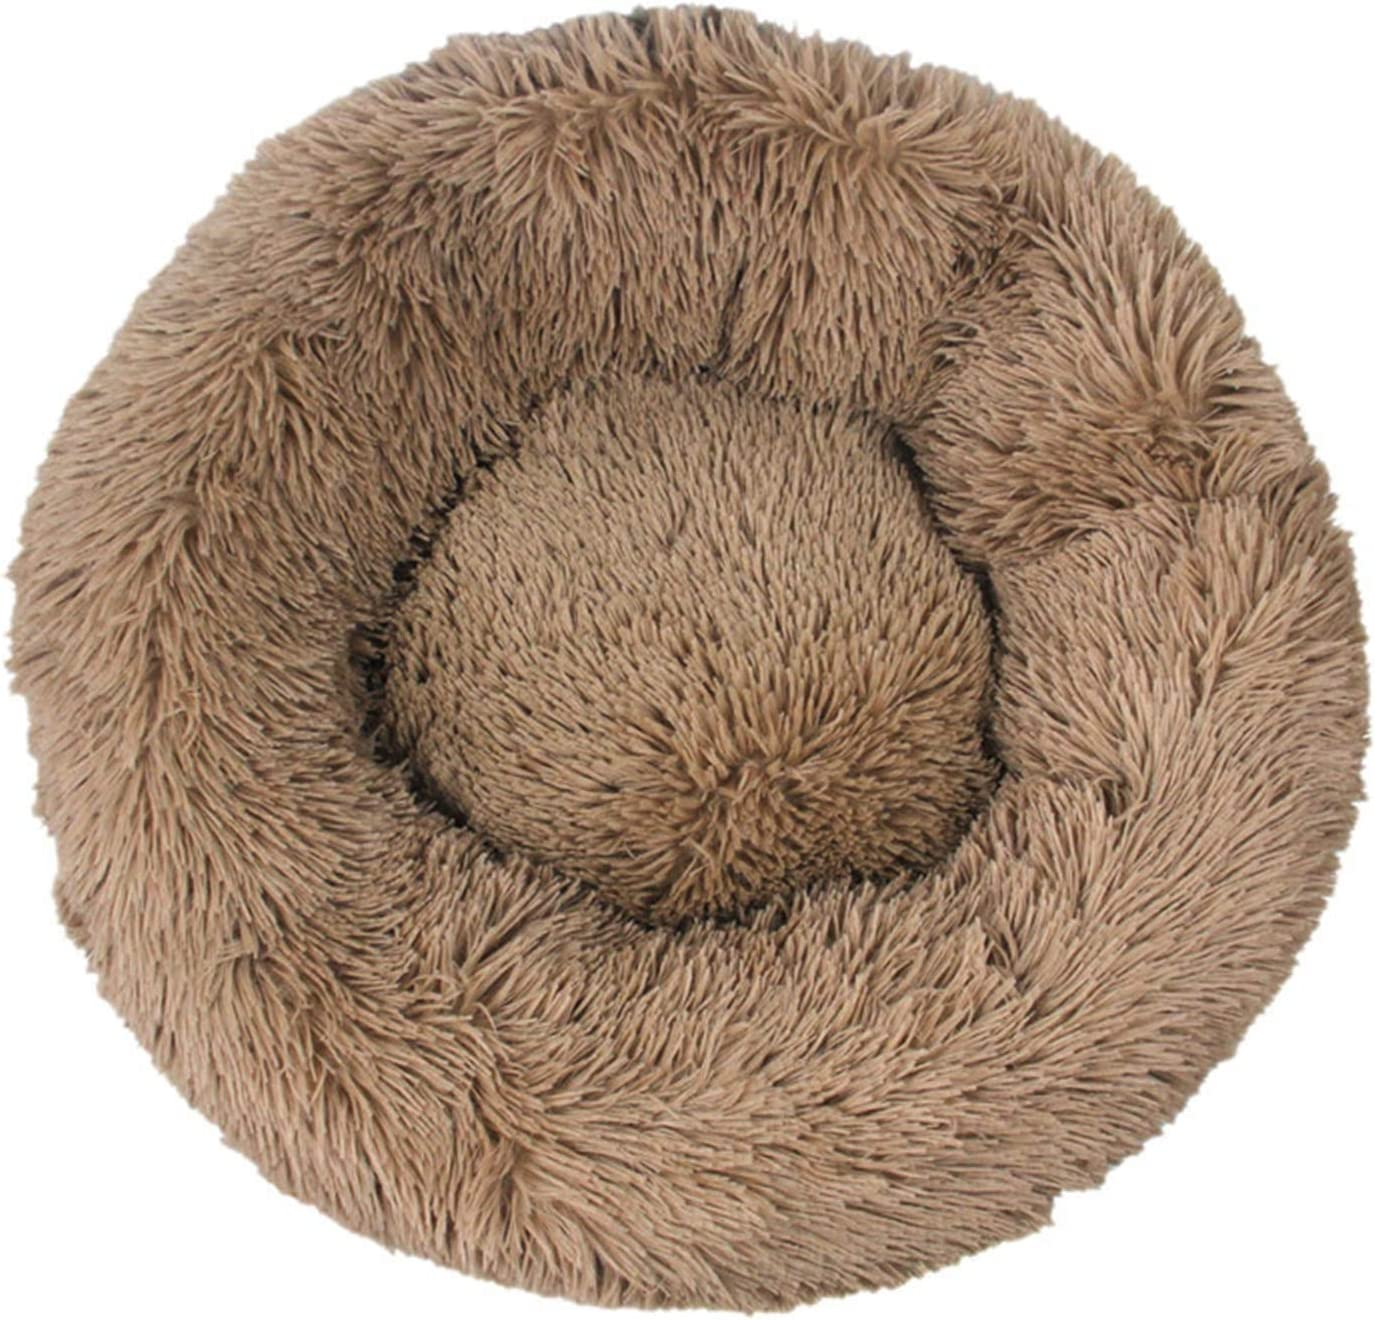 Manufacturer OFFicial shop Surprise price Pet Dog Bed Comfortable Donut Sof Kennel Ultra Cuddler Round